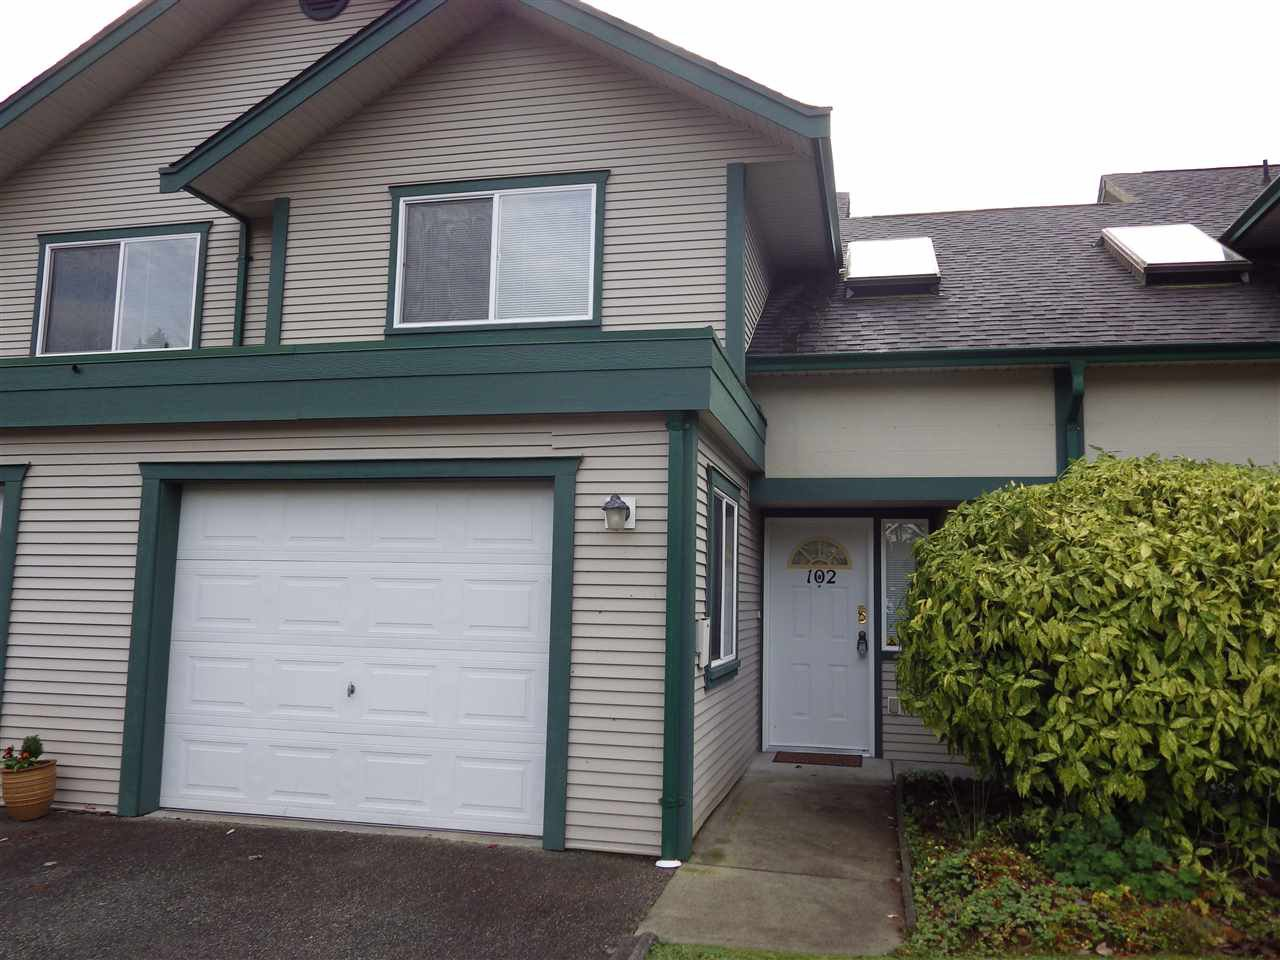 Main Photo: 102 5711 EBBTIDE Street in Sechelt: Sechelt District Townhouse for sale (Sunshine Coast)  : MLS®# R2122555